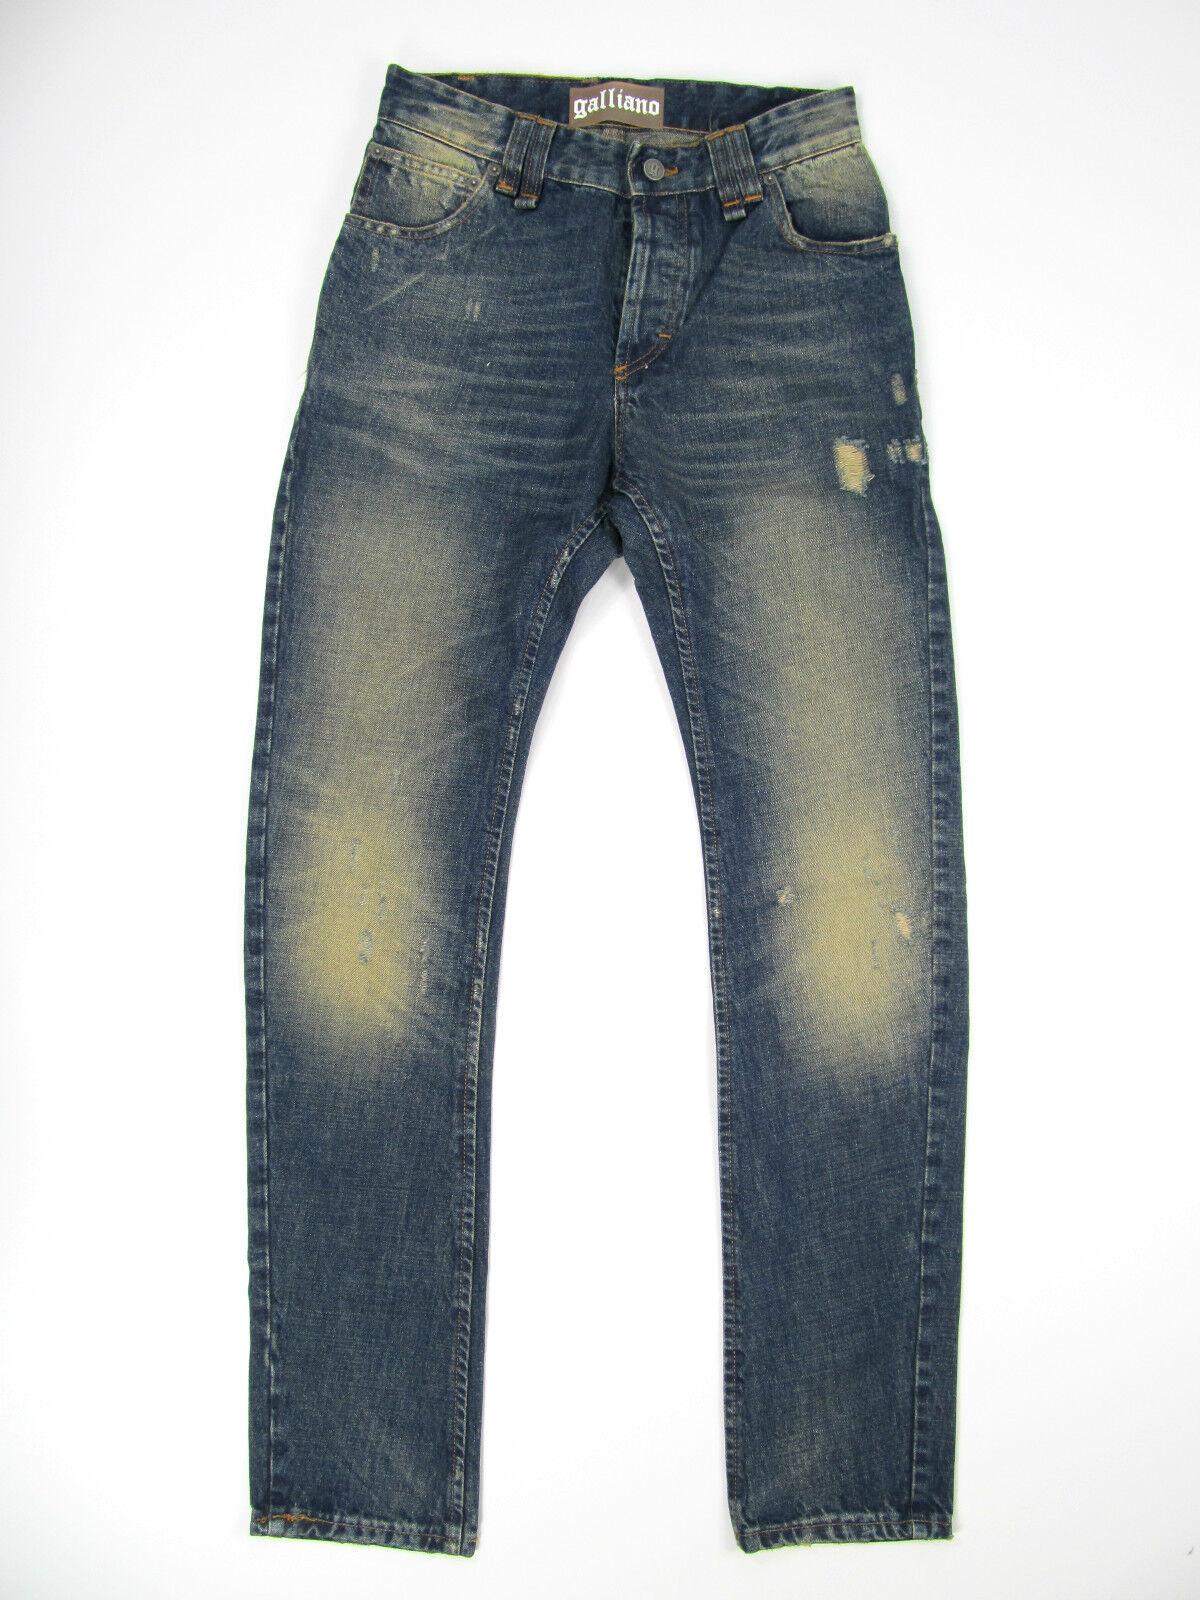 John Galliano Herren Jeans Authentic Hose Denim Pants Taperot Taperot Taperot Neu Blau 1d747c